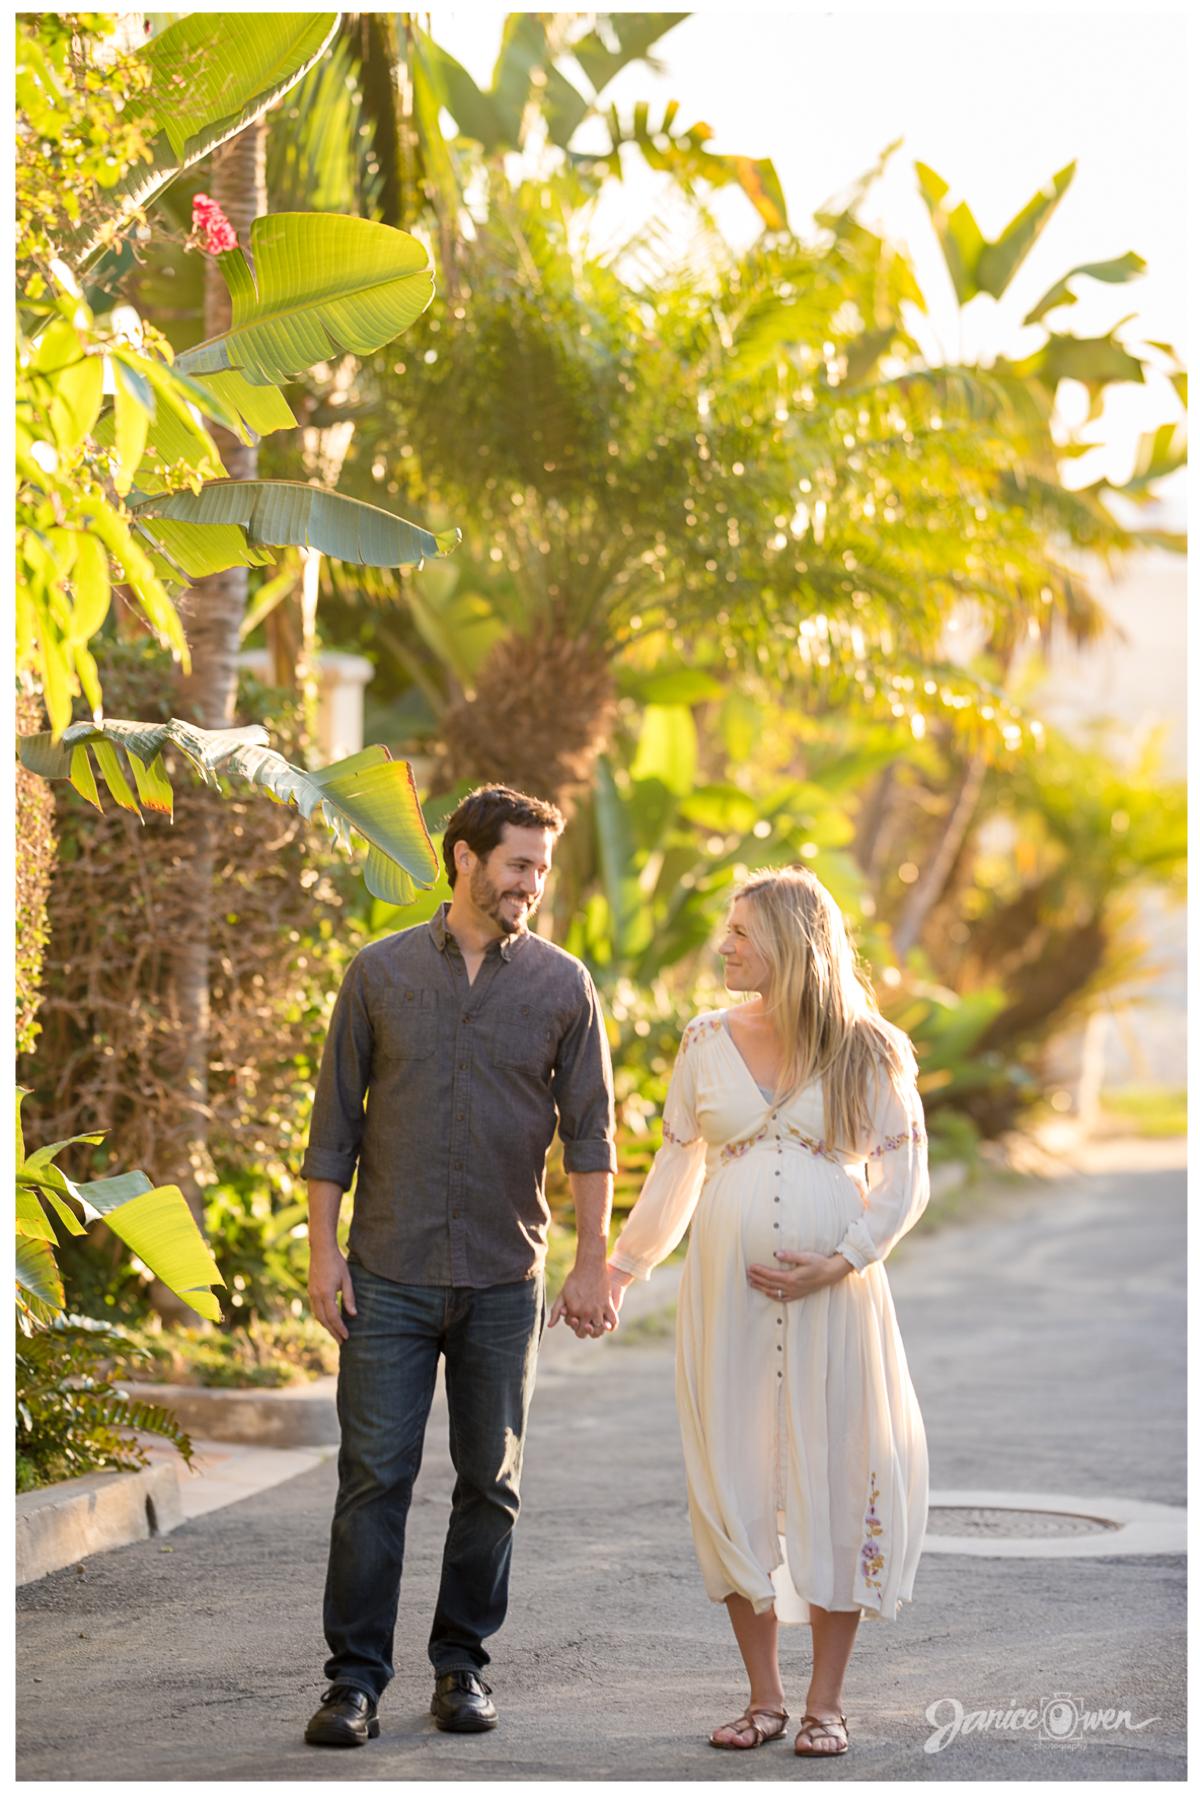 janiceowenphotography_Maternity 10.jpg